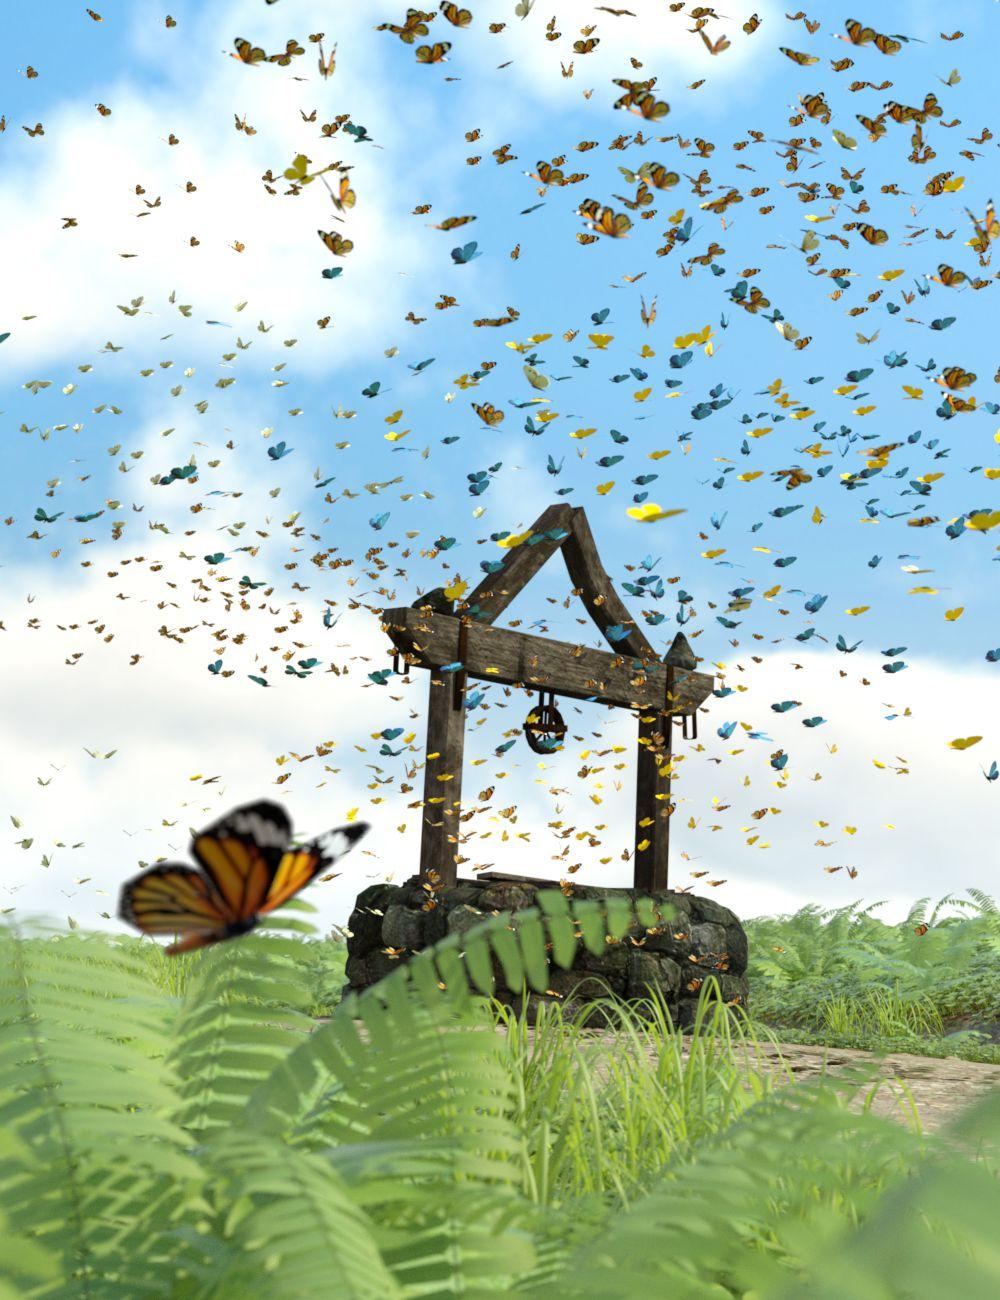 The Flock Butterflies by: DzFire, 3D Models by Daz 3D